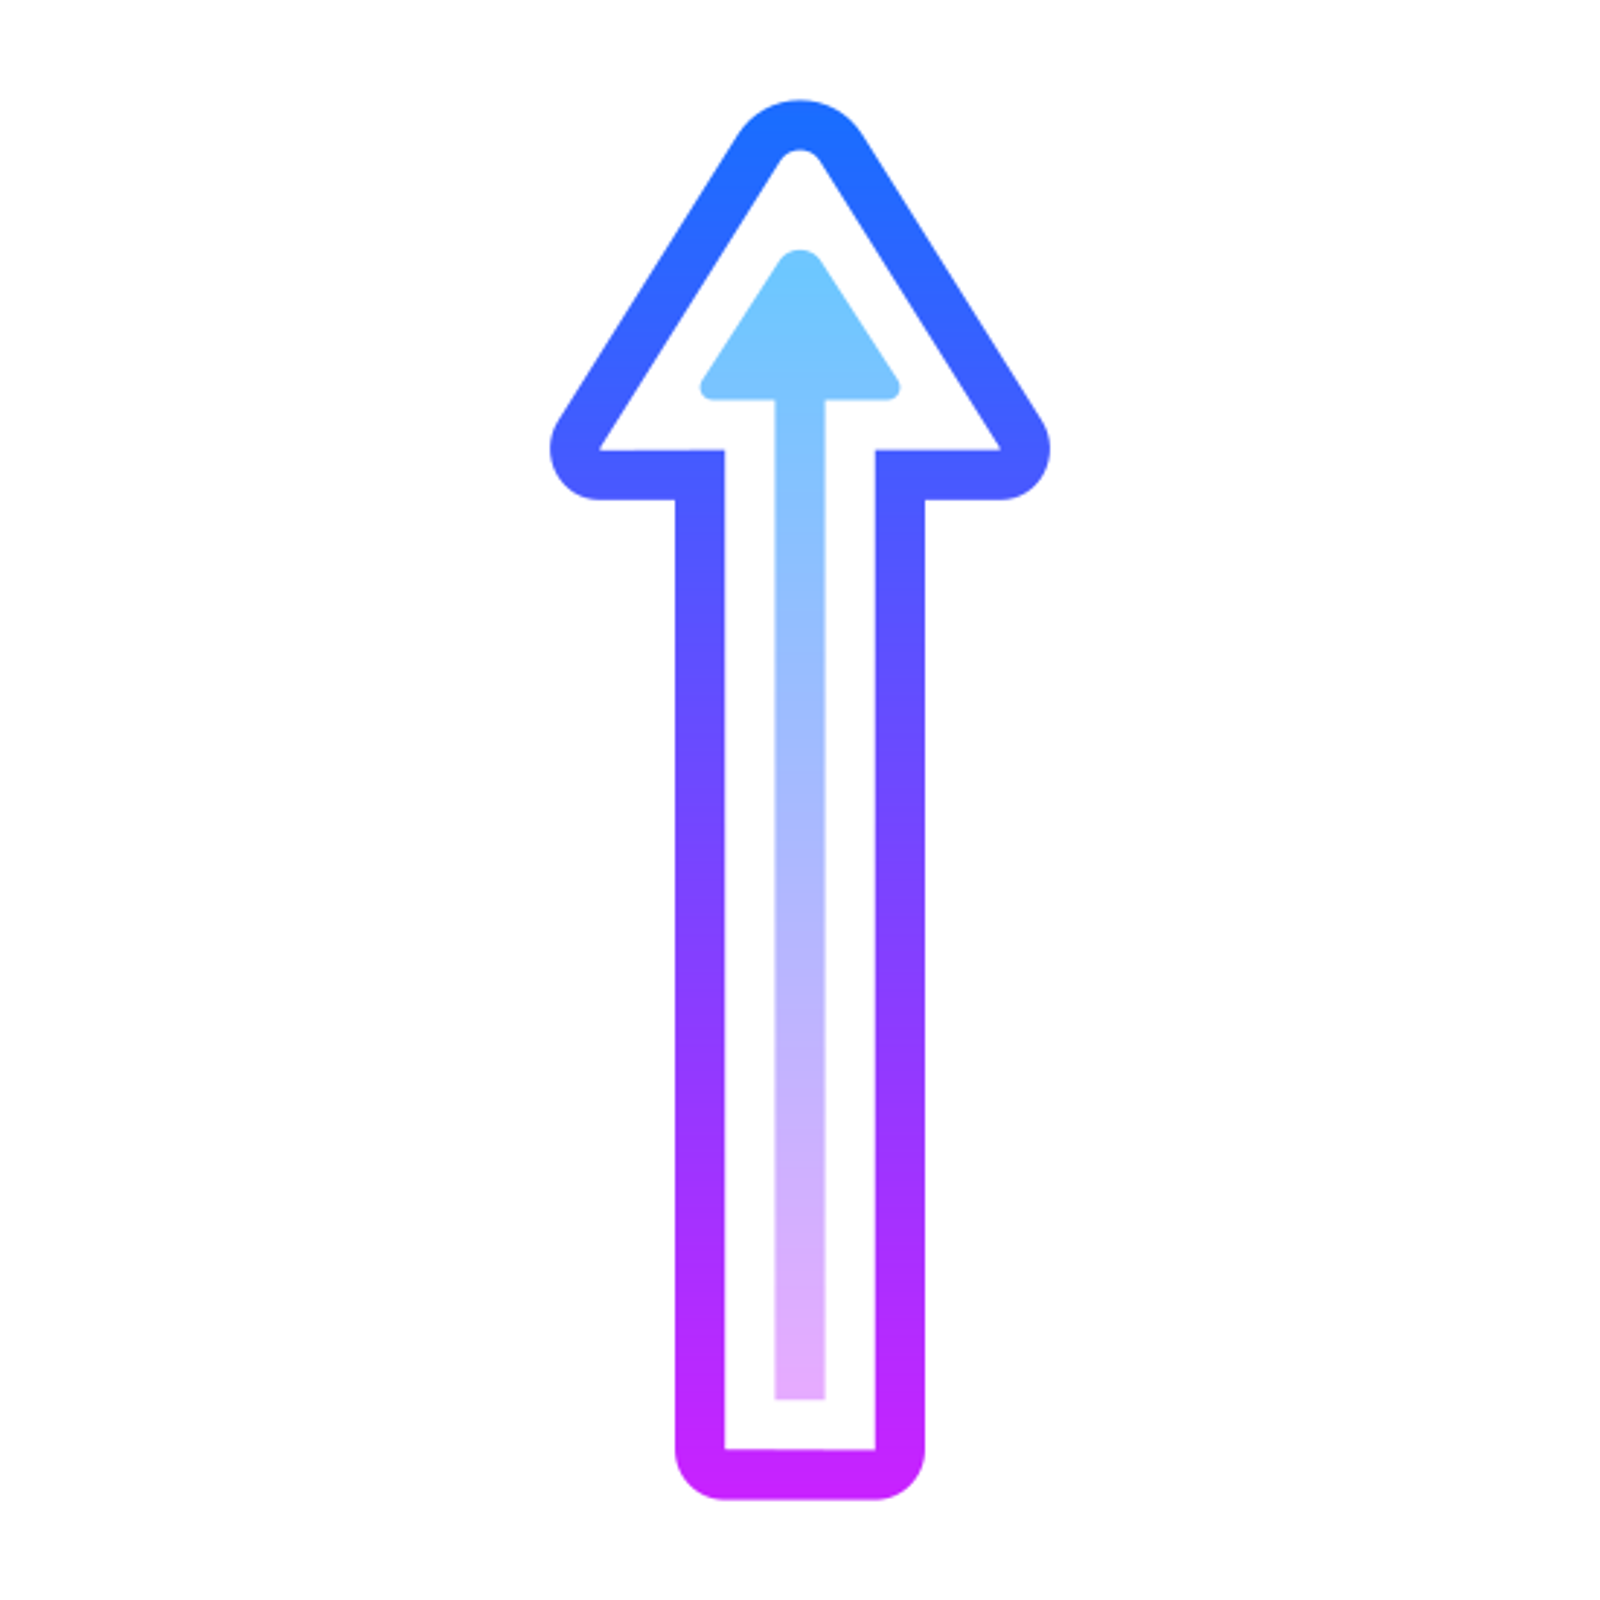 Long Arrow Up icon